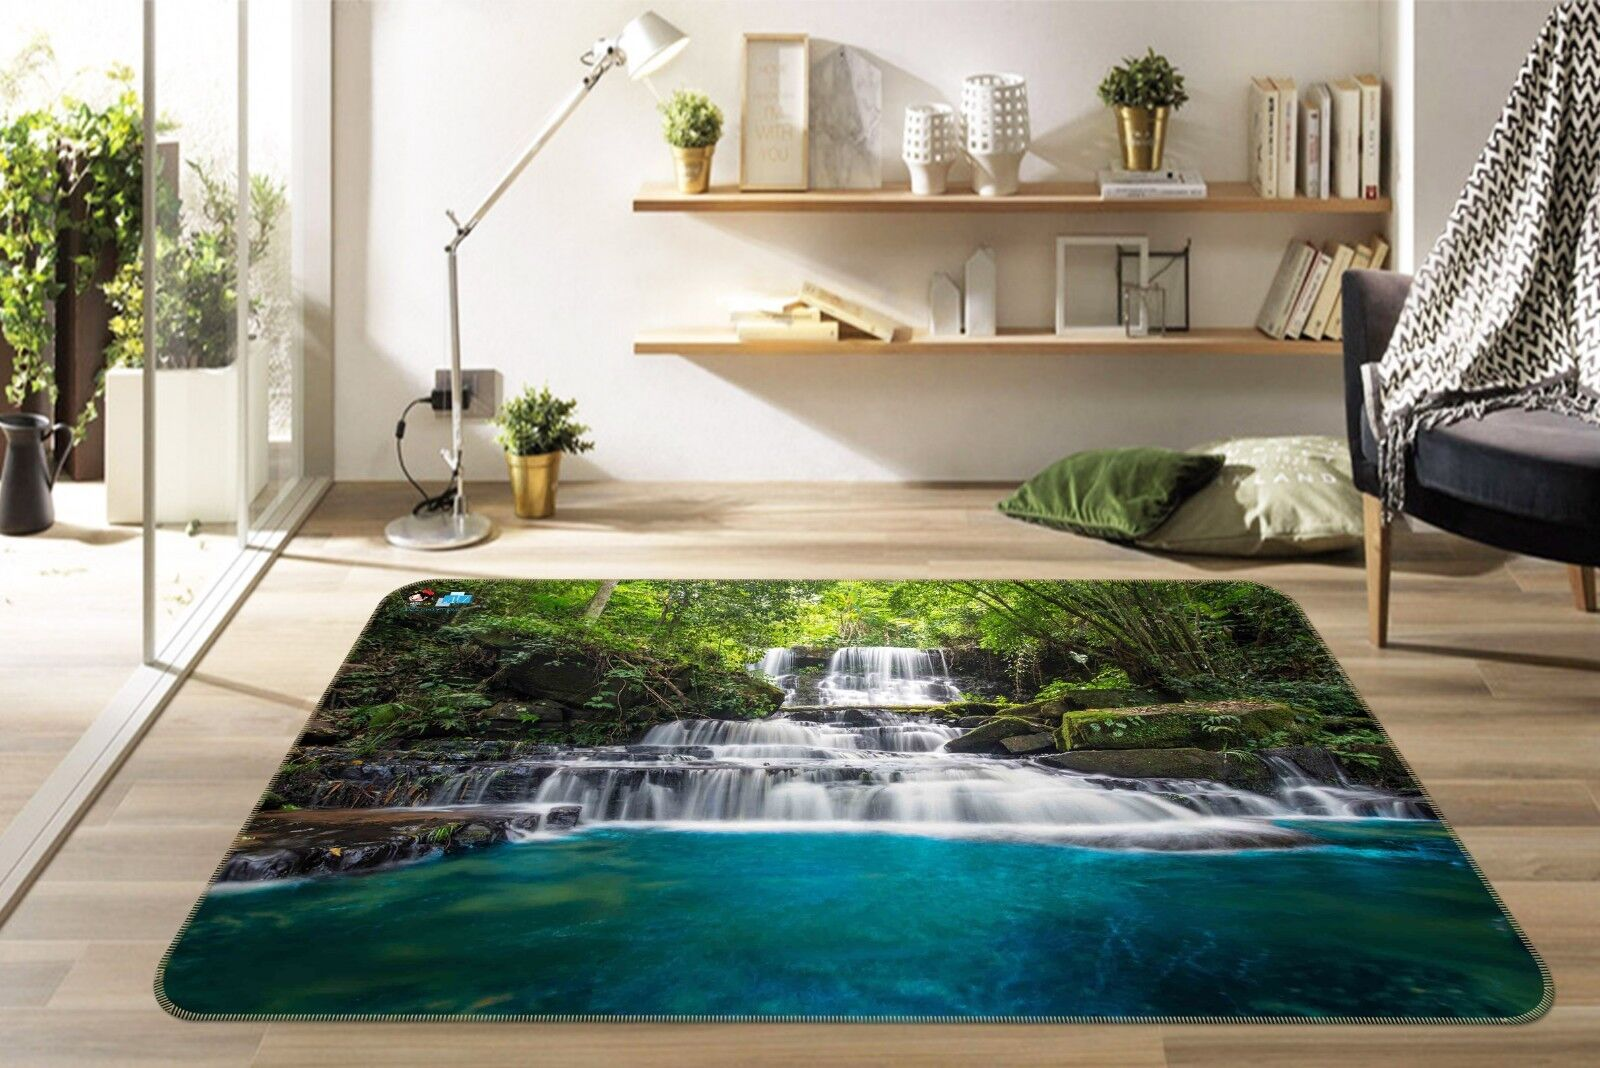 3D Stream 122 tappetino antiscivolo tappeto camera Tappetino Qualità Elegante foto Tappeto UK Estate